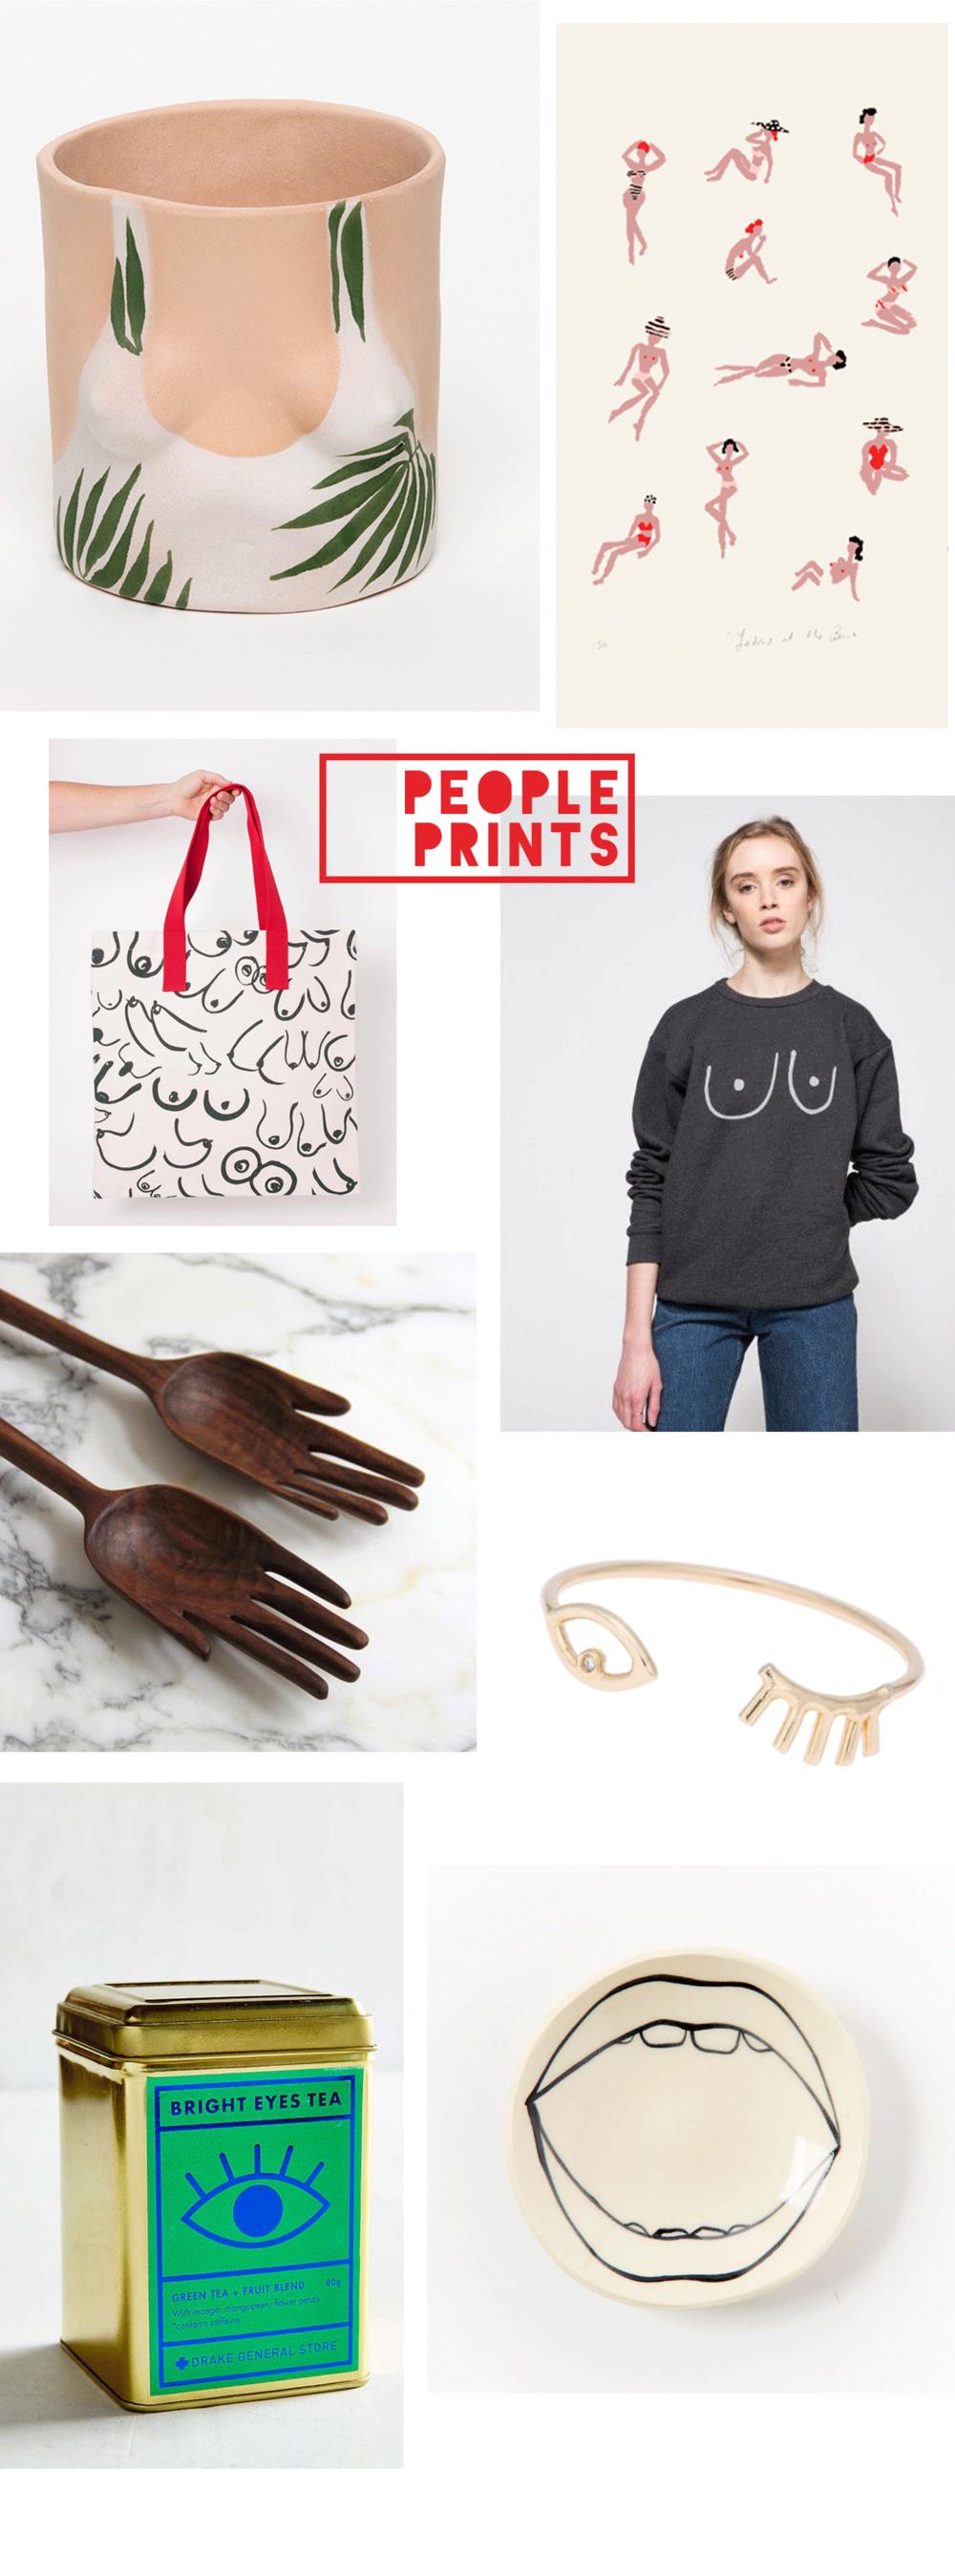 people prints | @themissprints